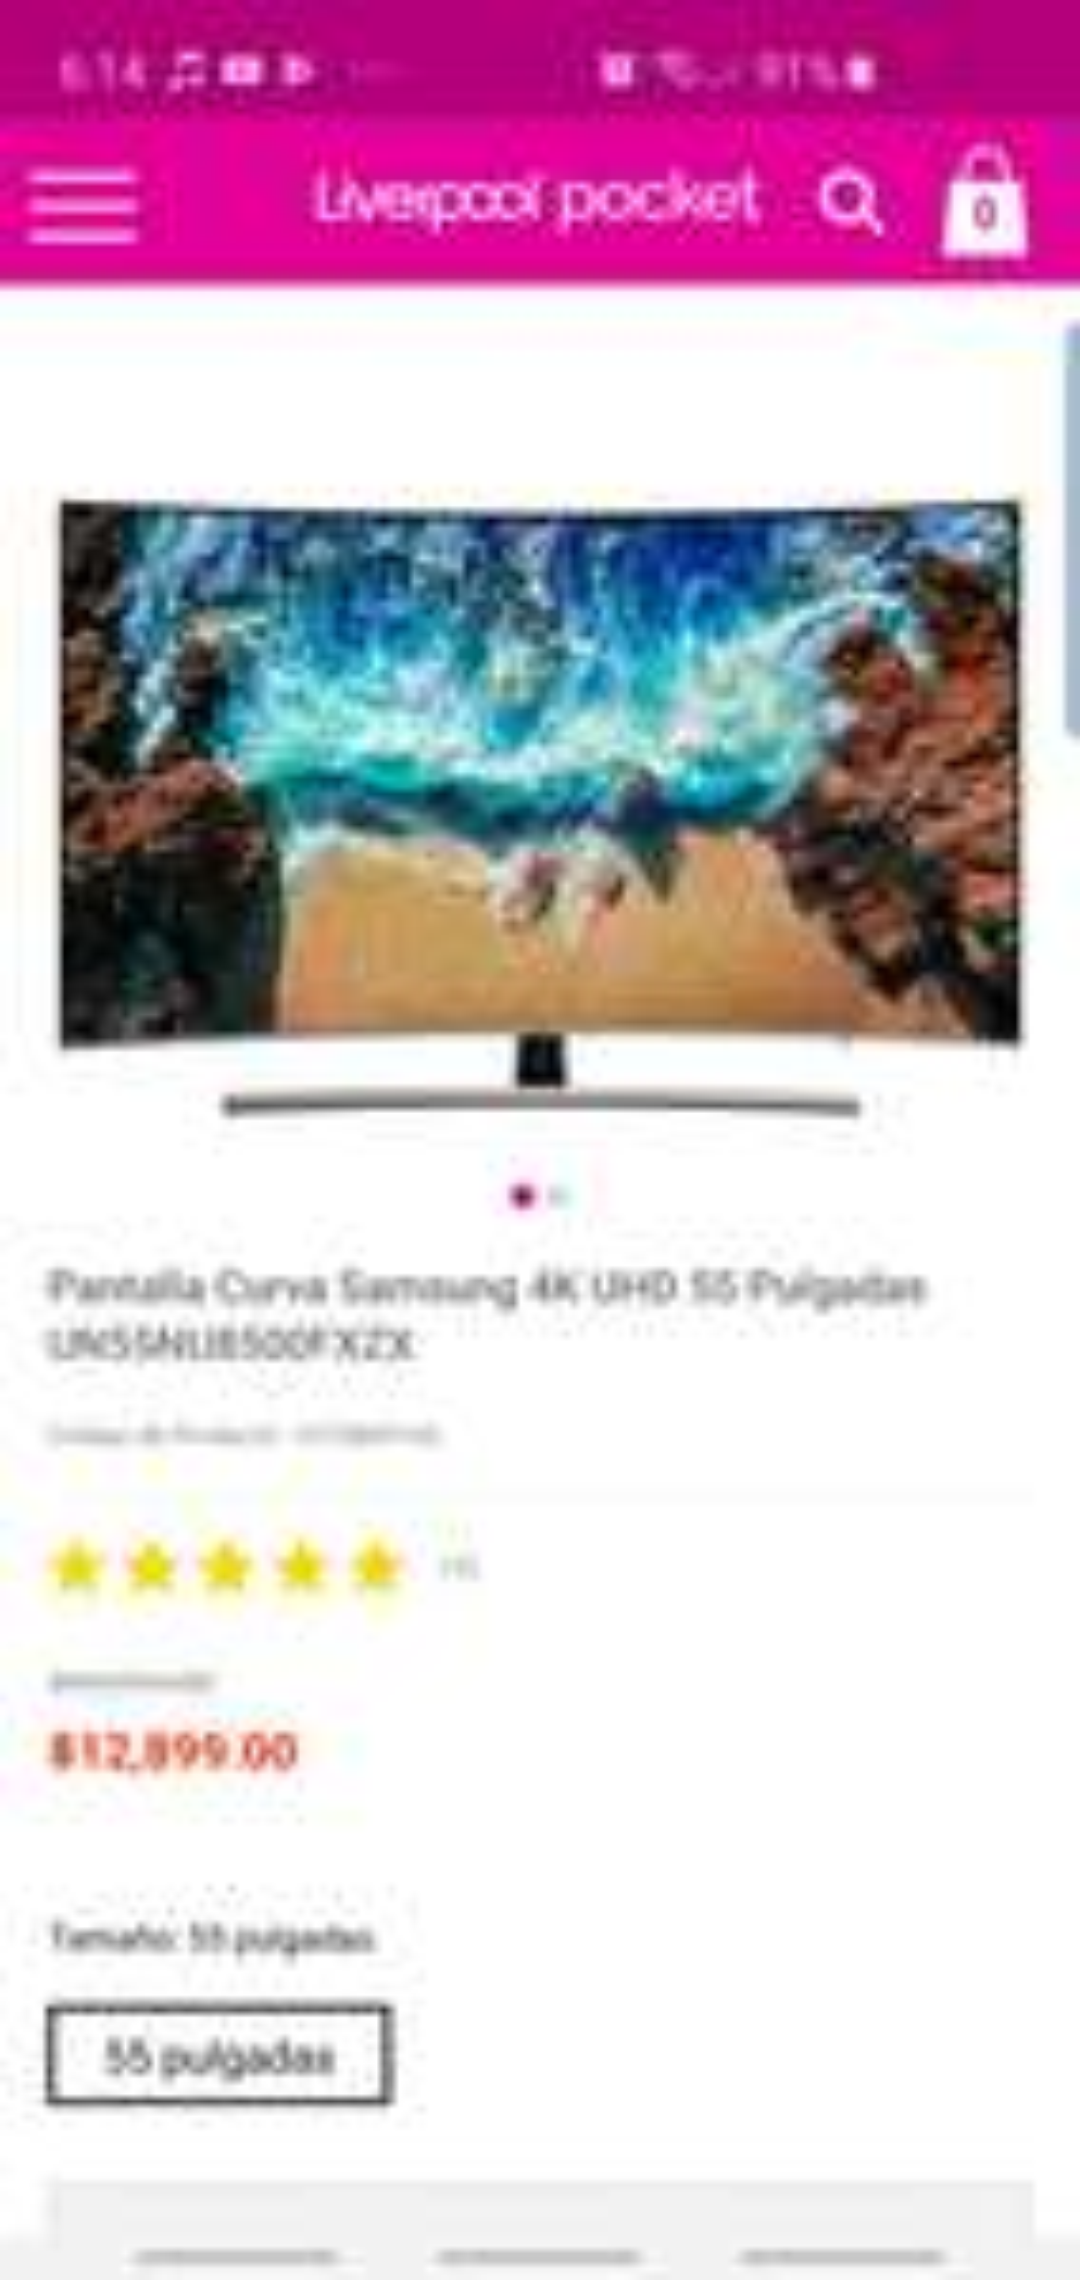 Liverpool: Pantalla Curva Samsung 4K UHD 55 Pulgadas UN55NU8500FXZX